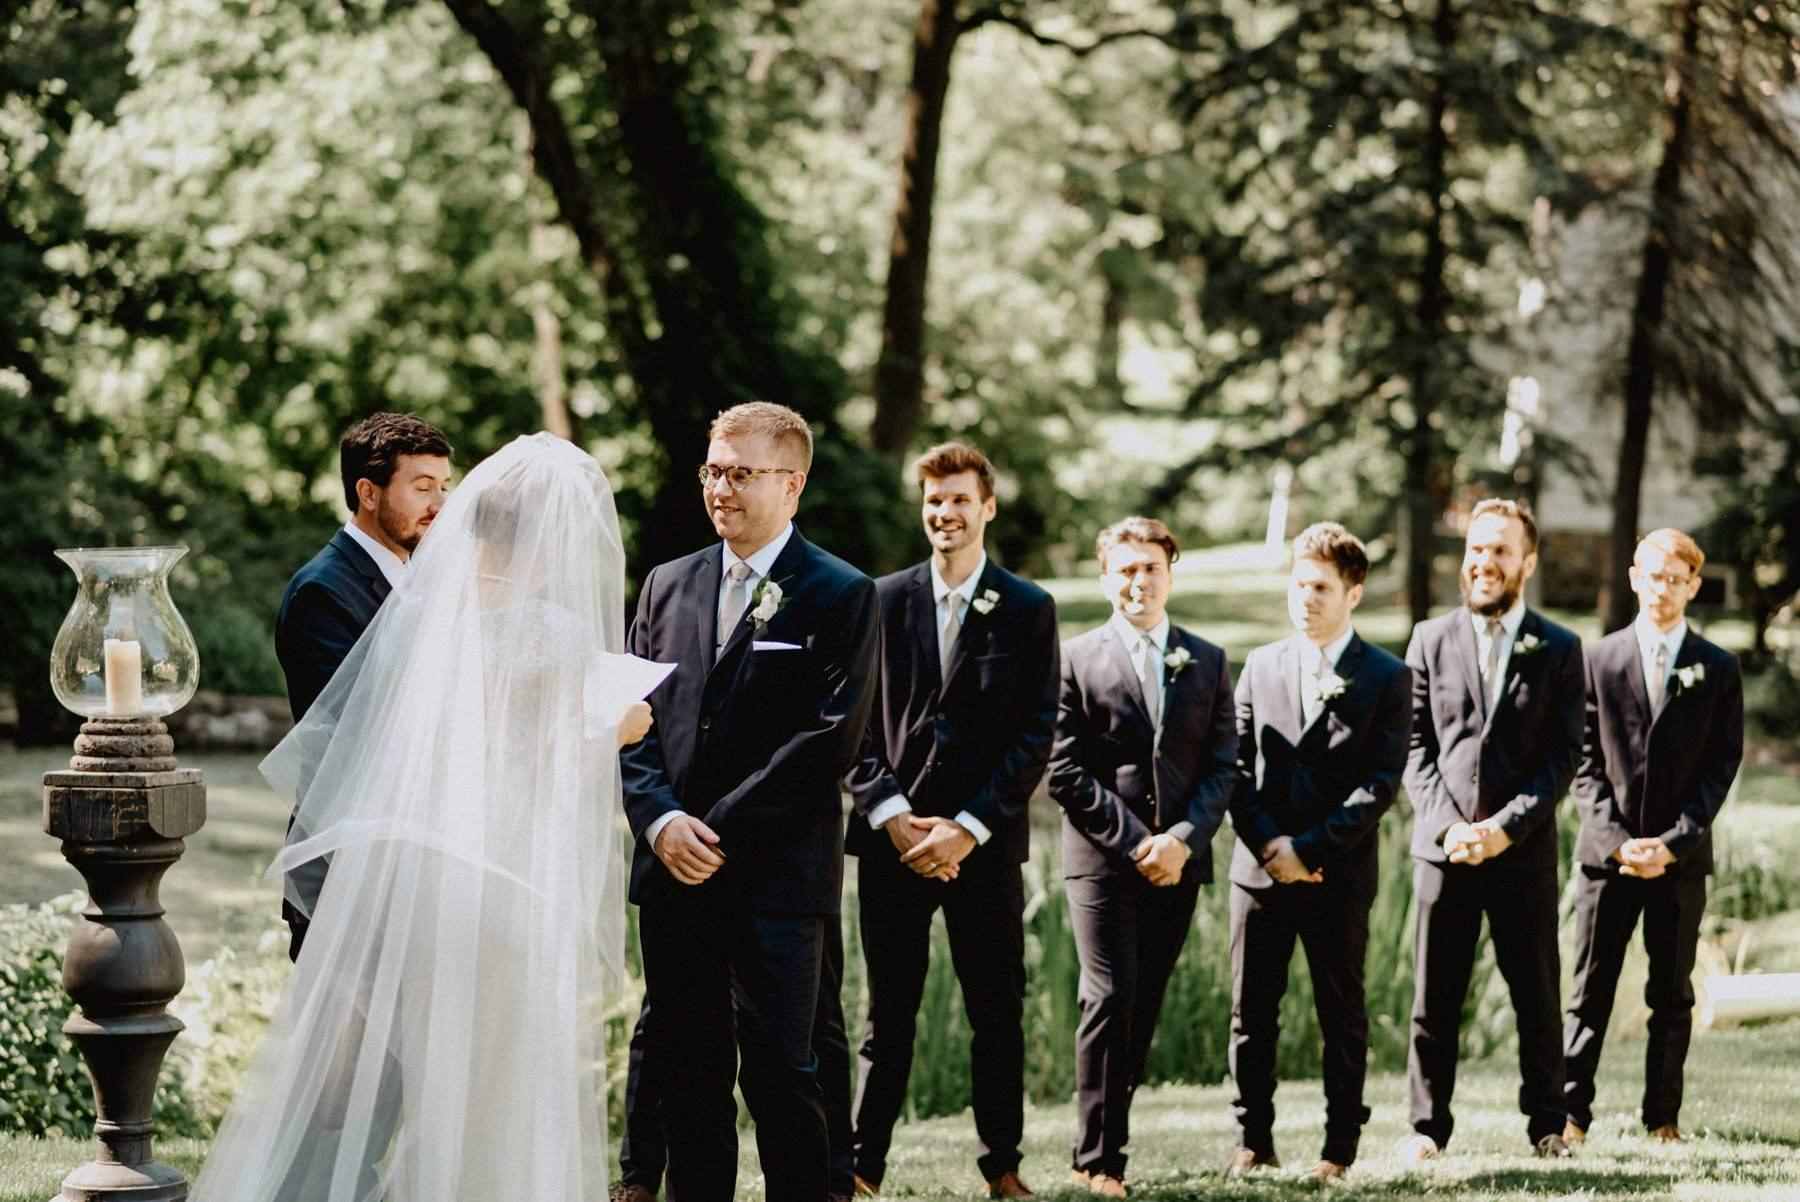 Appleford-estate-wedding-87.jpg